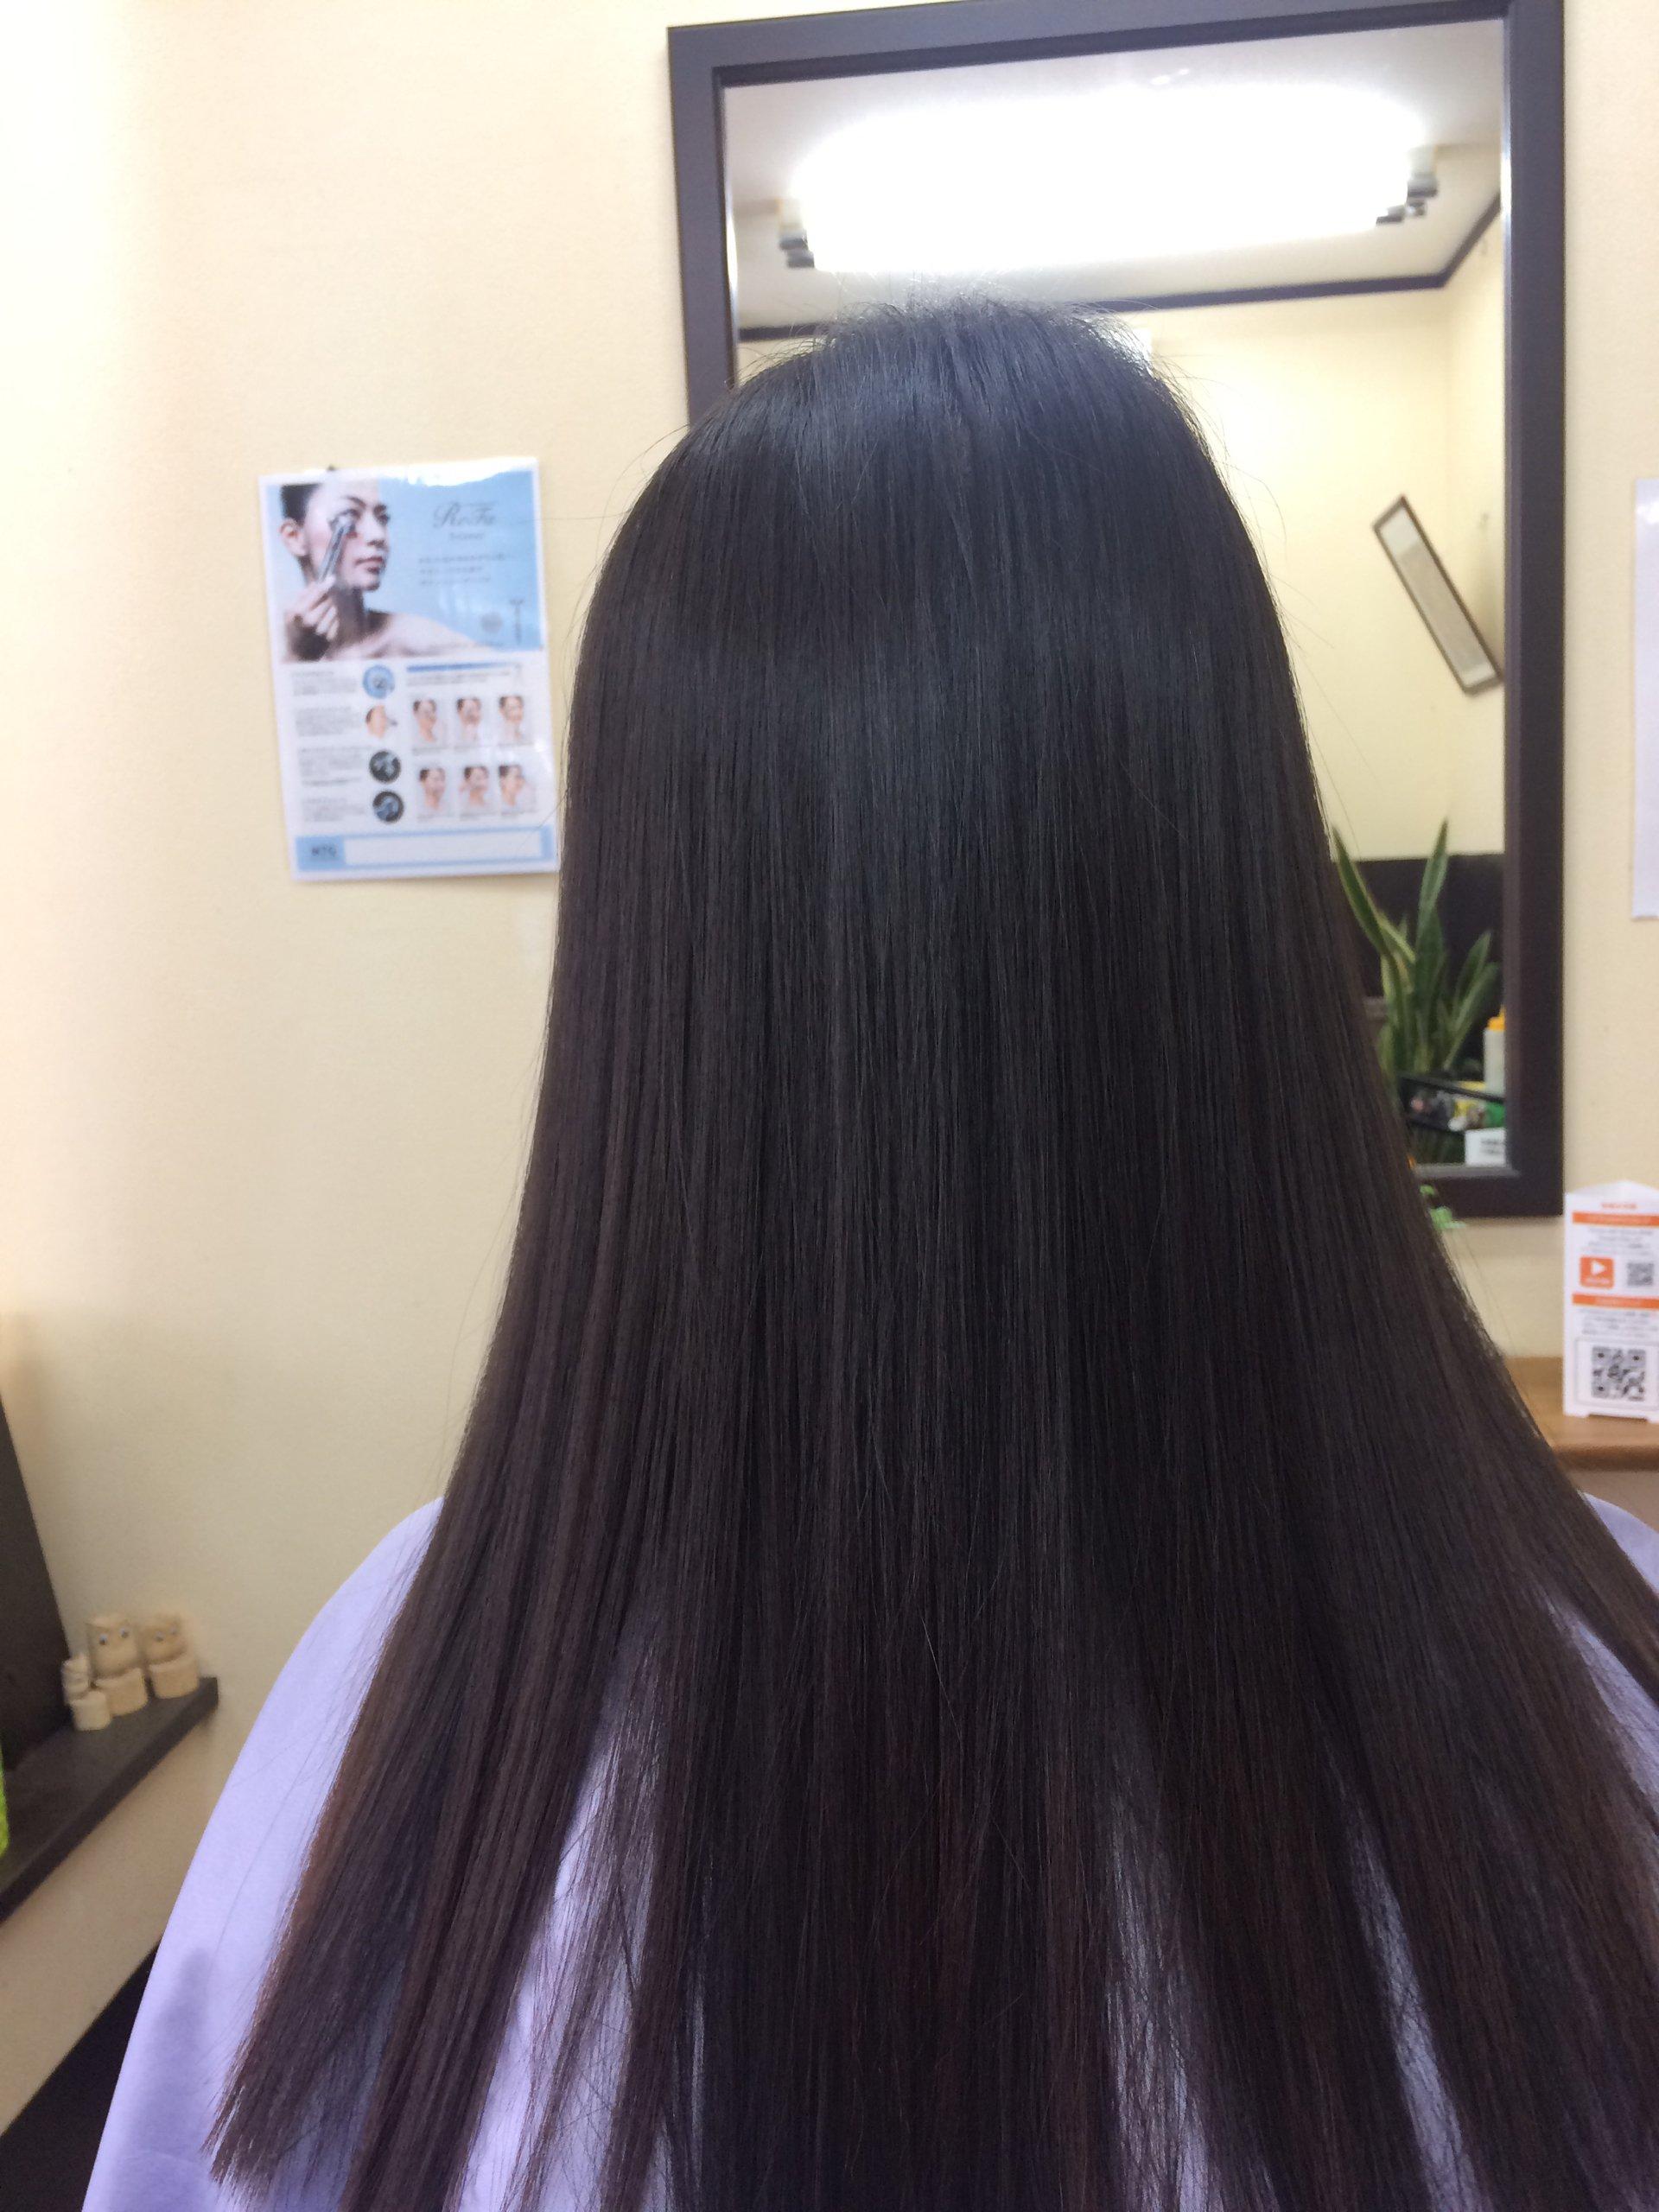 Hair salon(ヘアサロン)て・と・て|福島市・美容室・ヘナ・イルミナカラー・メヘンディ